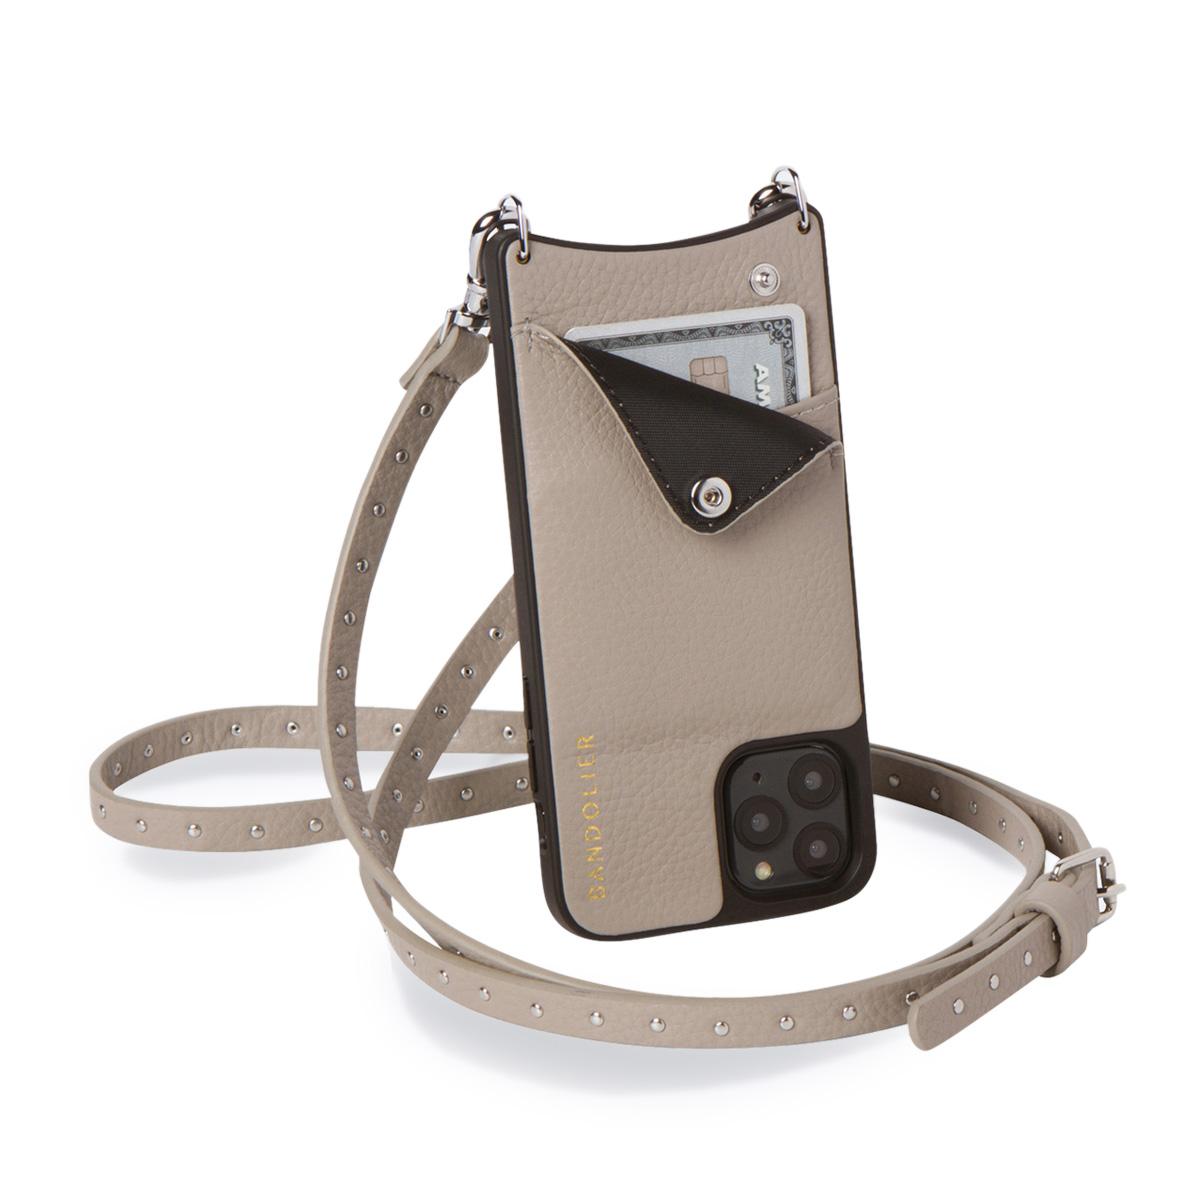 BANDOLIER iPhone SE SE2 8 7 6s 6 ケース スマホ 携帯 ショルダー アイフォン メンズ レディース レザー NICOLE GREGE グレー 10NIC